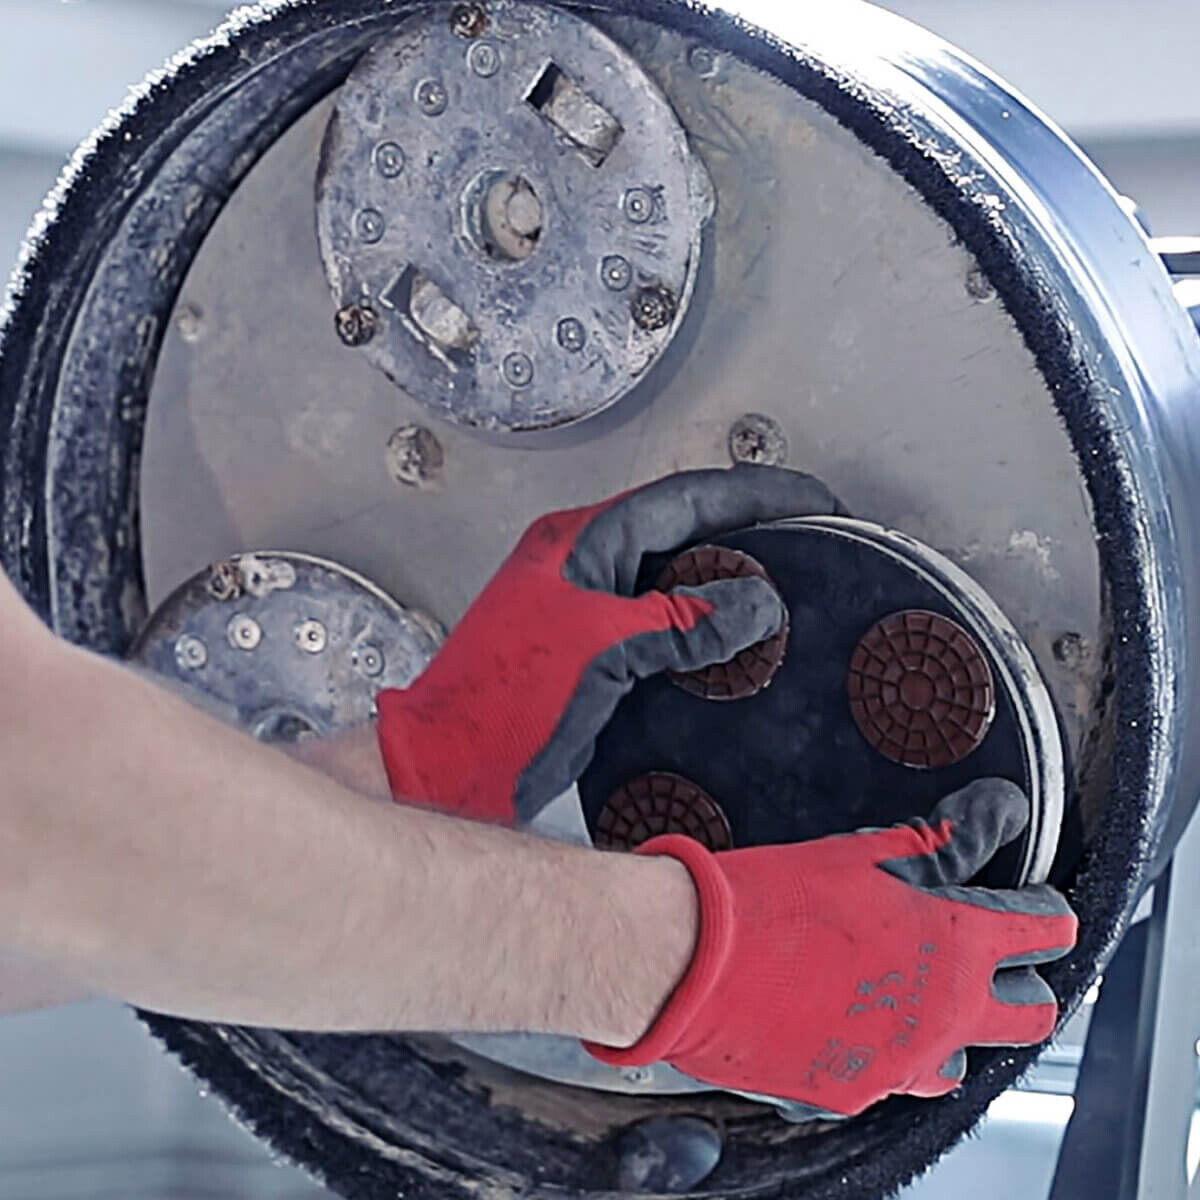 Husqvarna P600 Dry Resin Concrete Pads